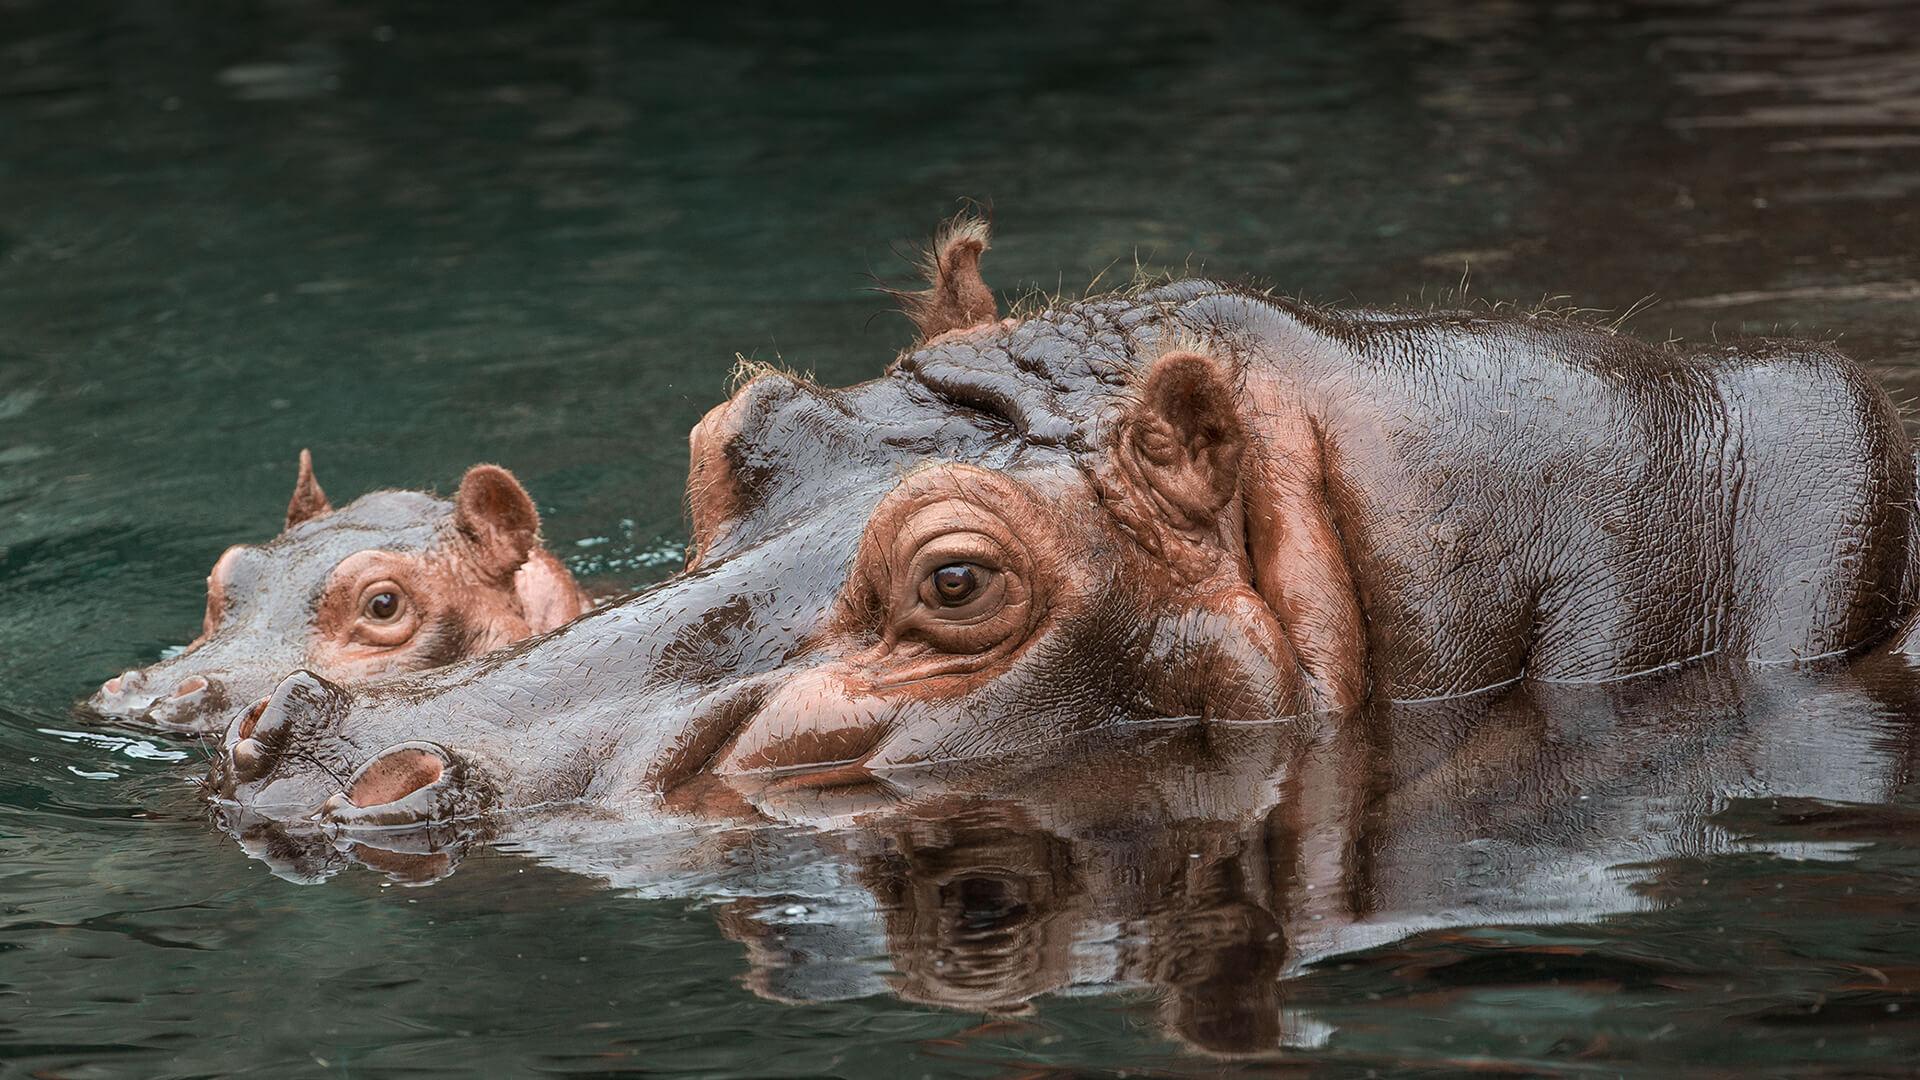 Hippo | San Diego Zoo Animals & Plants